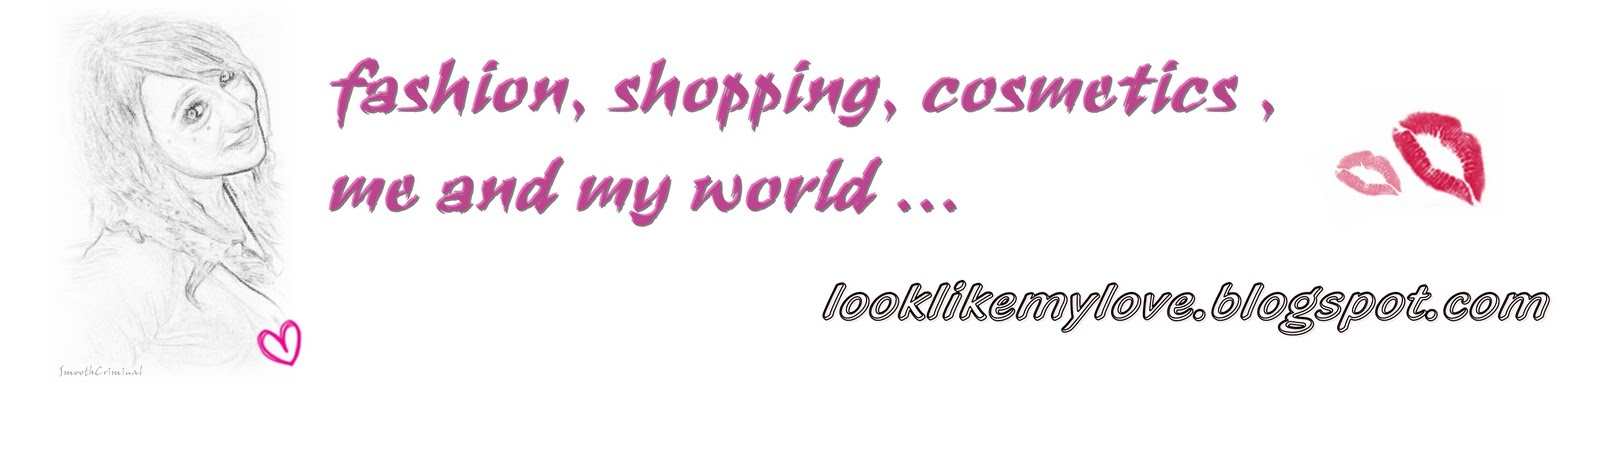 fashion, shopping, cosmetics, me and my world